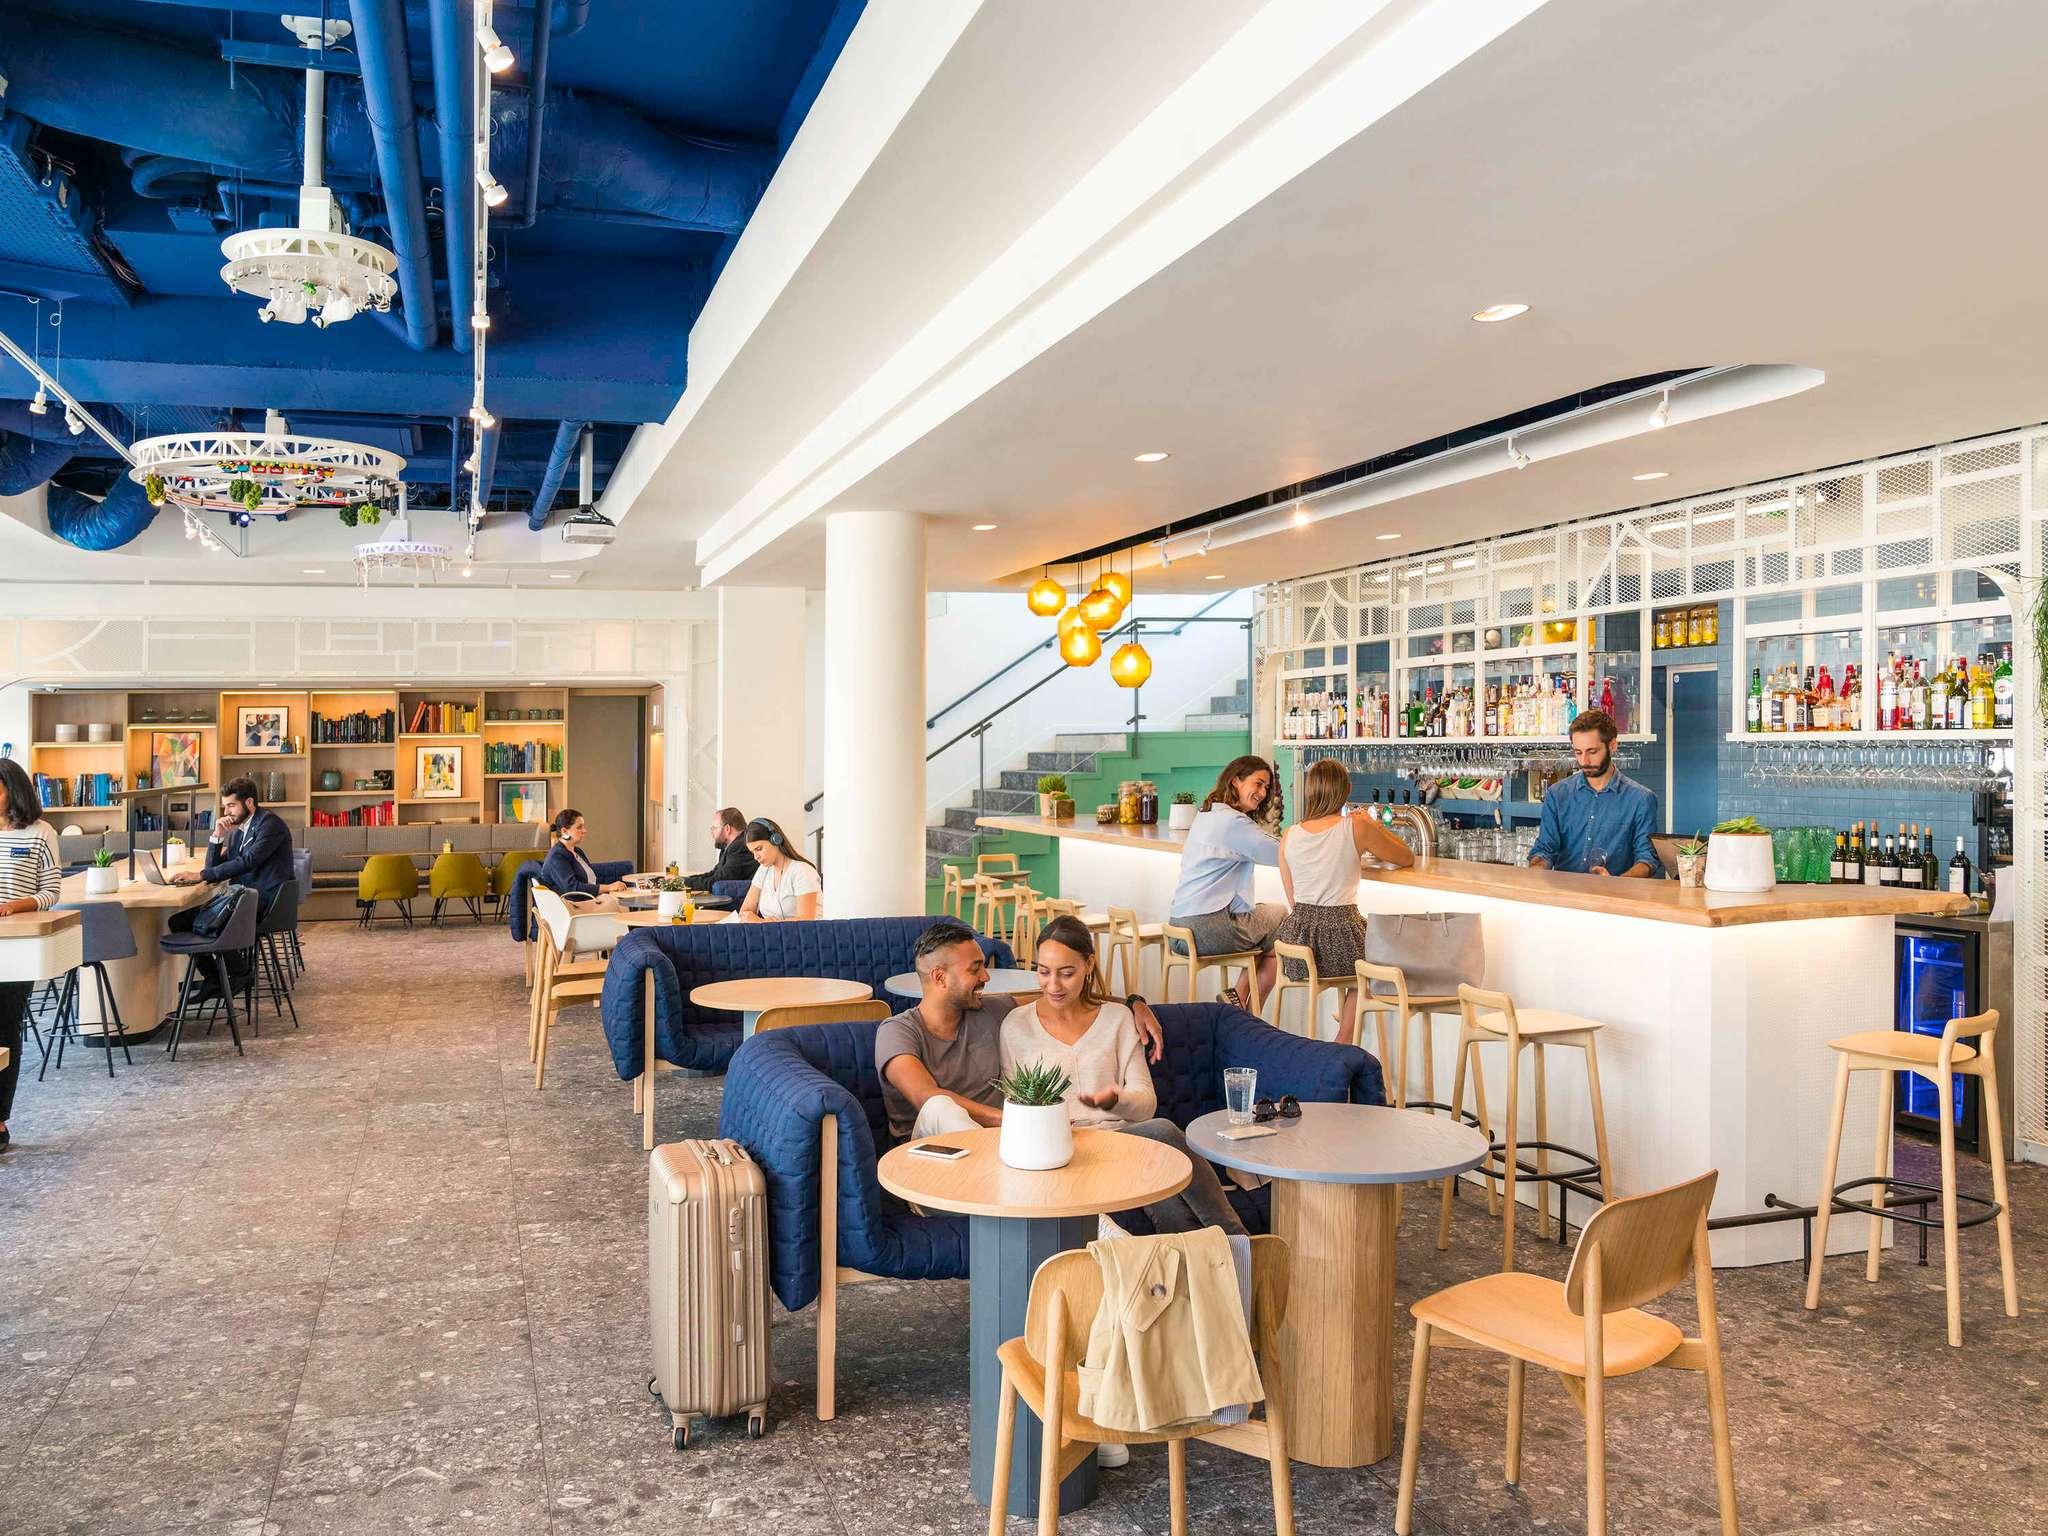 Hotell – Novotel Paris Centre Gare Montparnasse